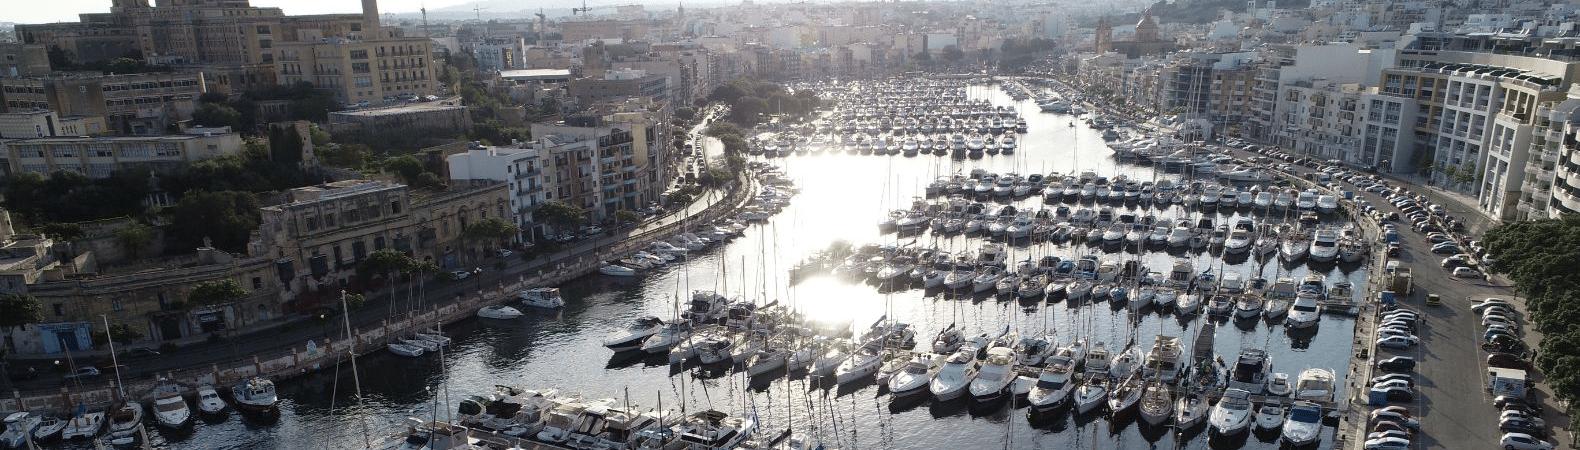 ta xbiex marina boatcare trading limited